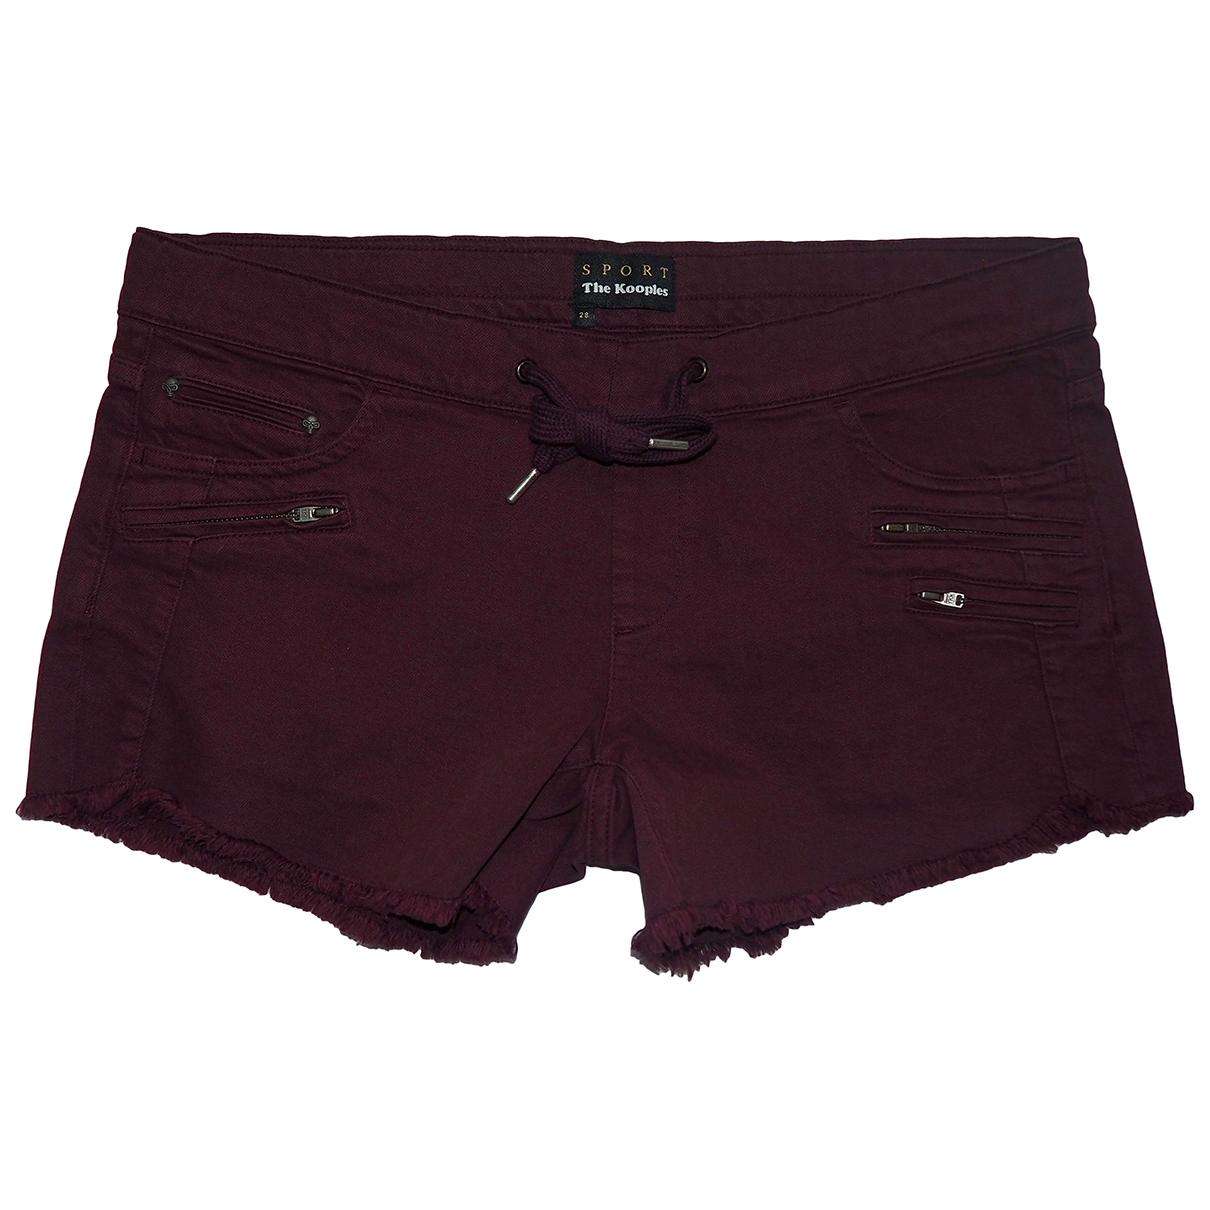 The Kooples \N Burgundy Cotton - elasthane Shorts for Women 38 FR